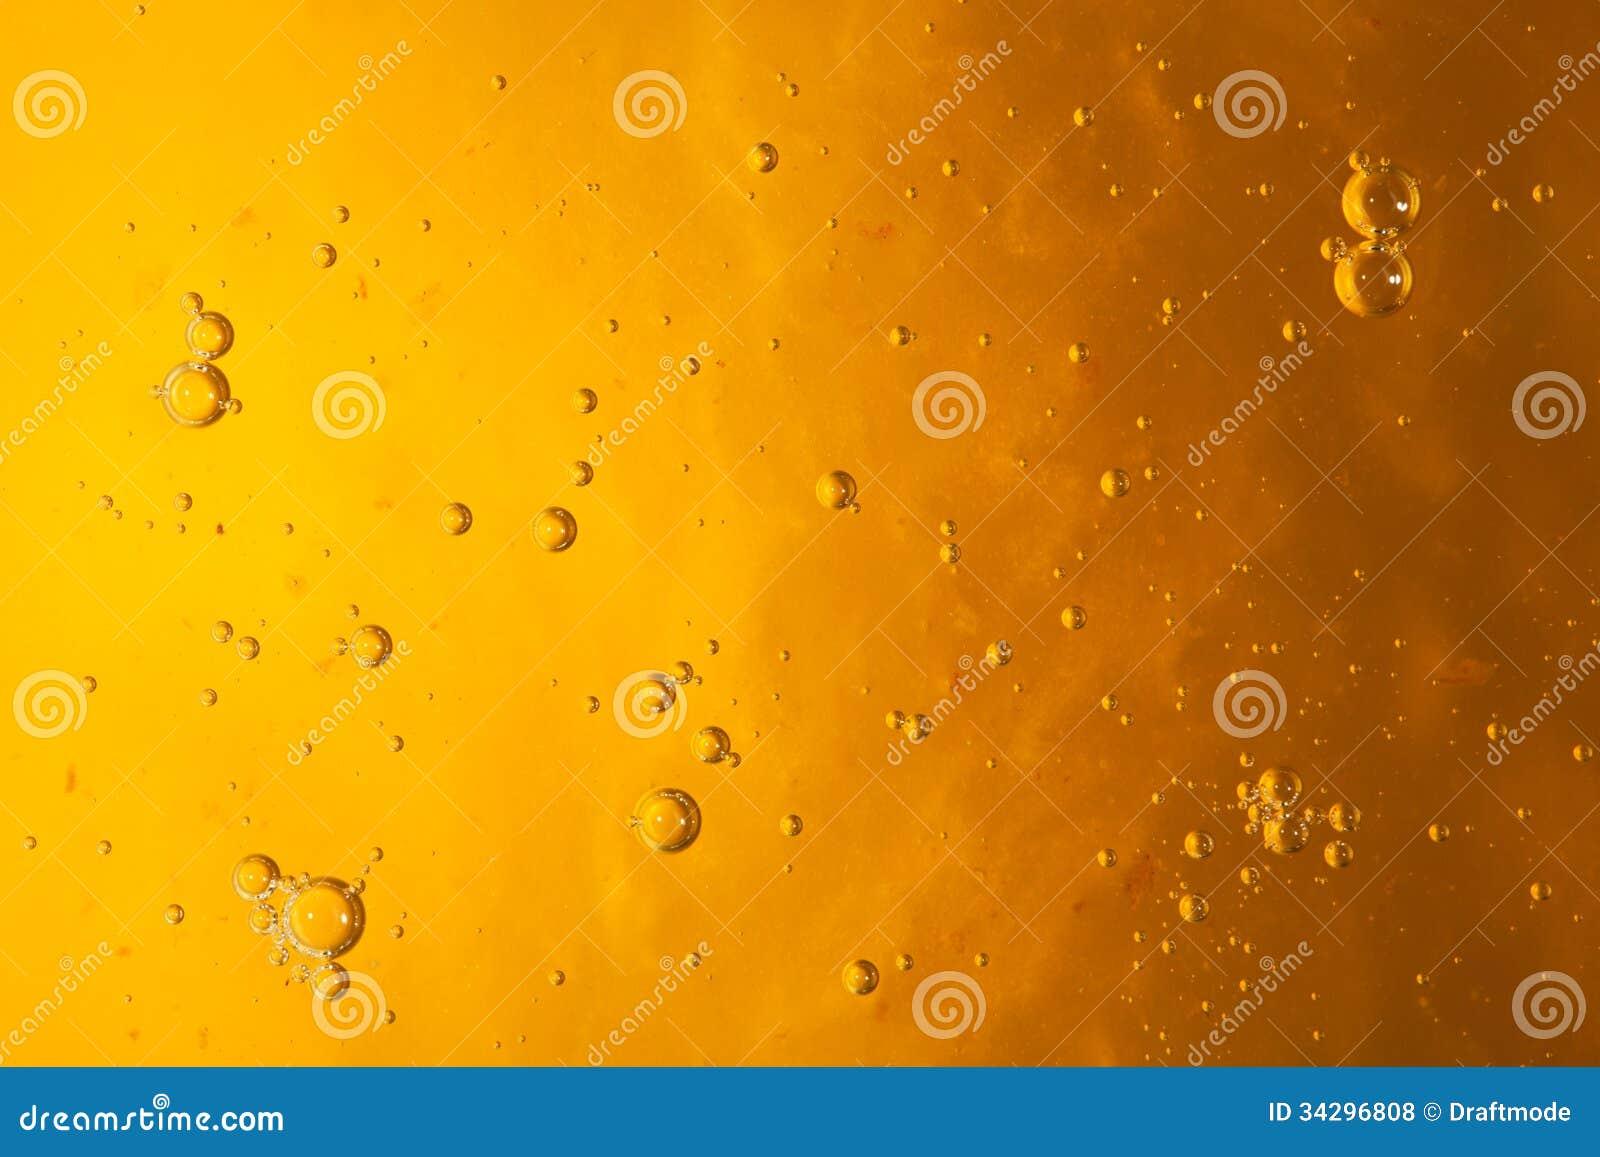 how to make liquid honey oil